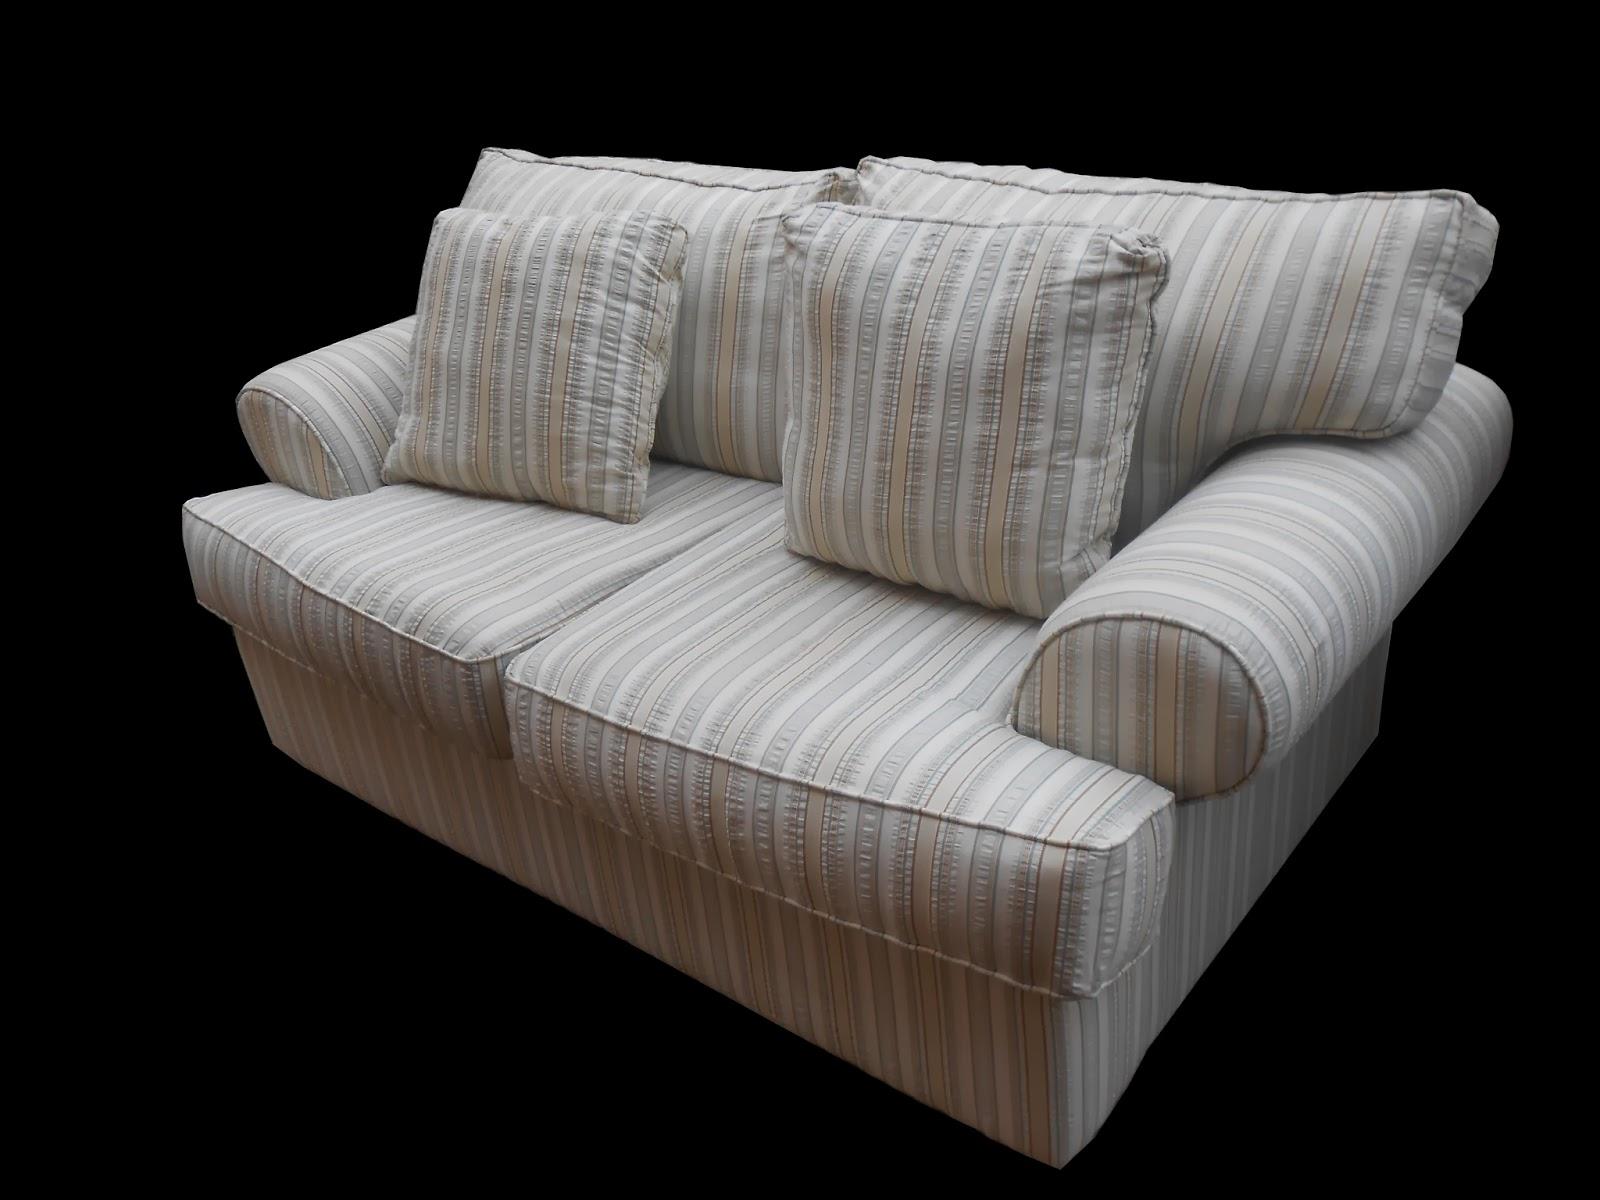 Uhuru Furniture Amp Collectibles Pastel Earthtone Striped